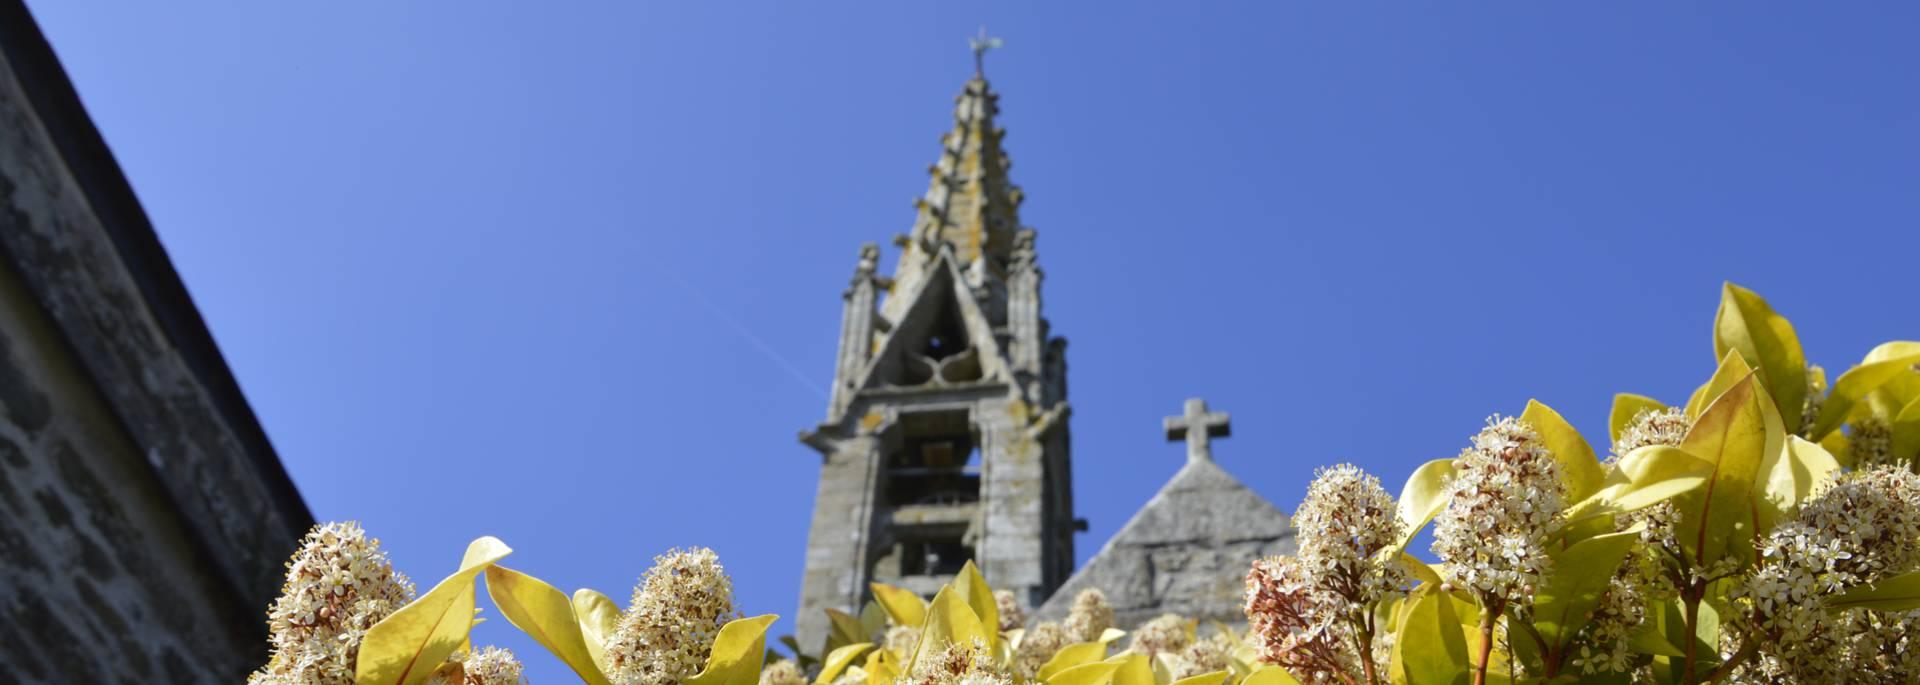 Eglise Saint Annouarn © M Hamel